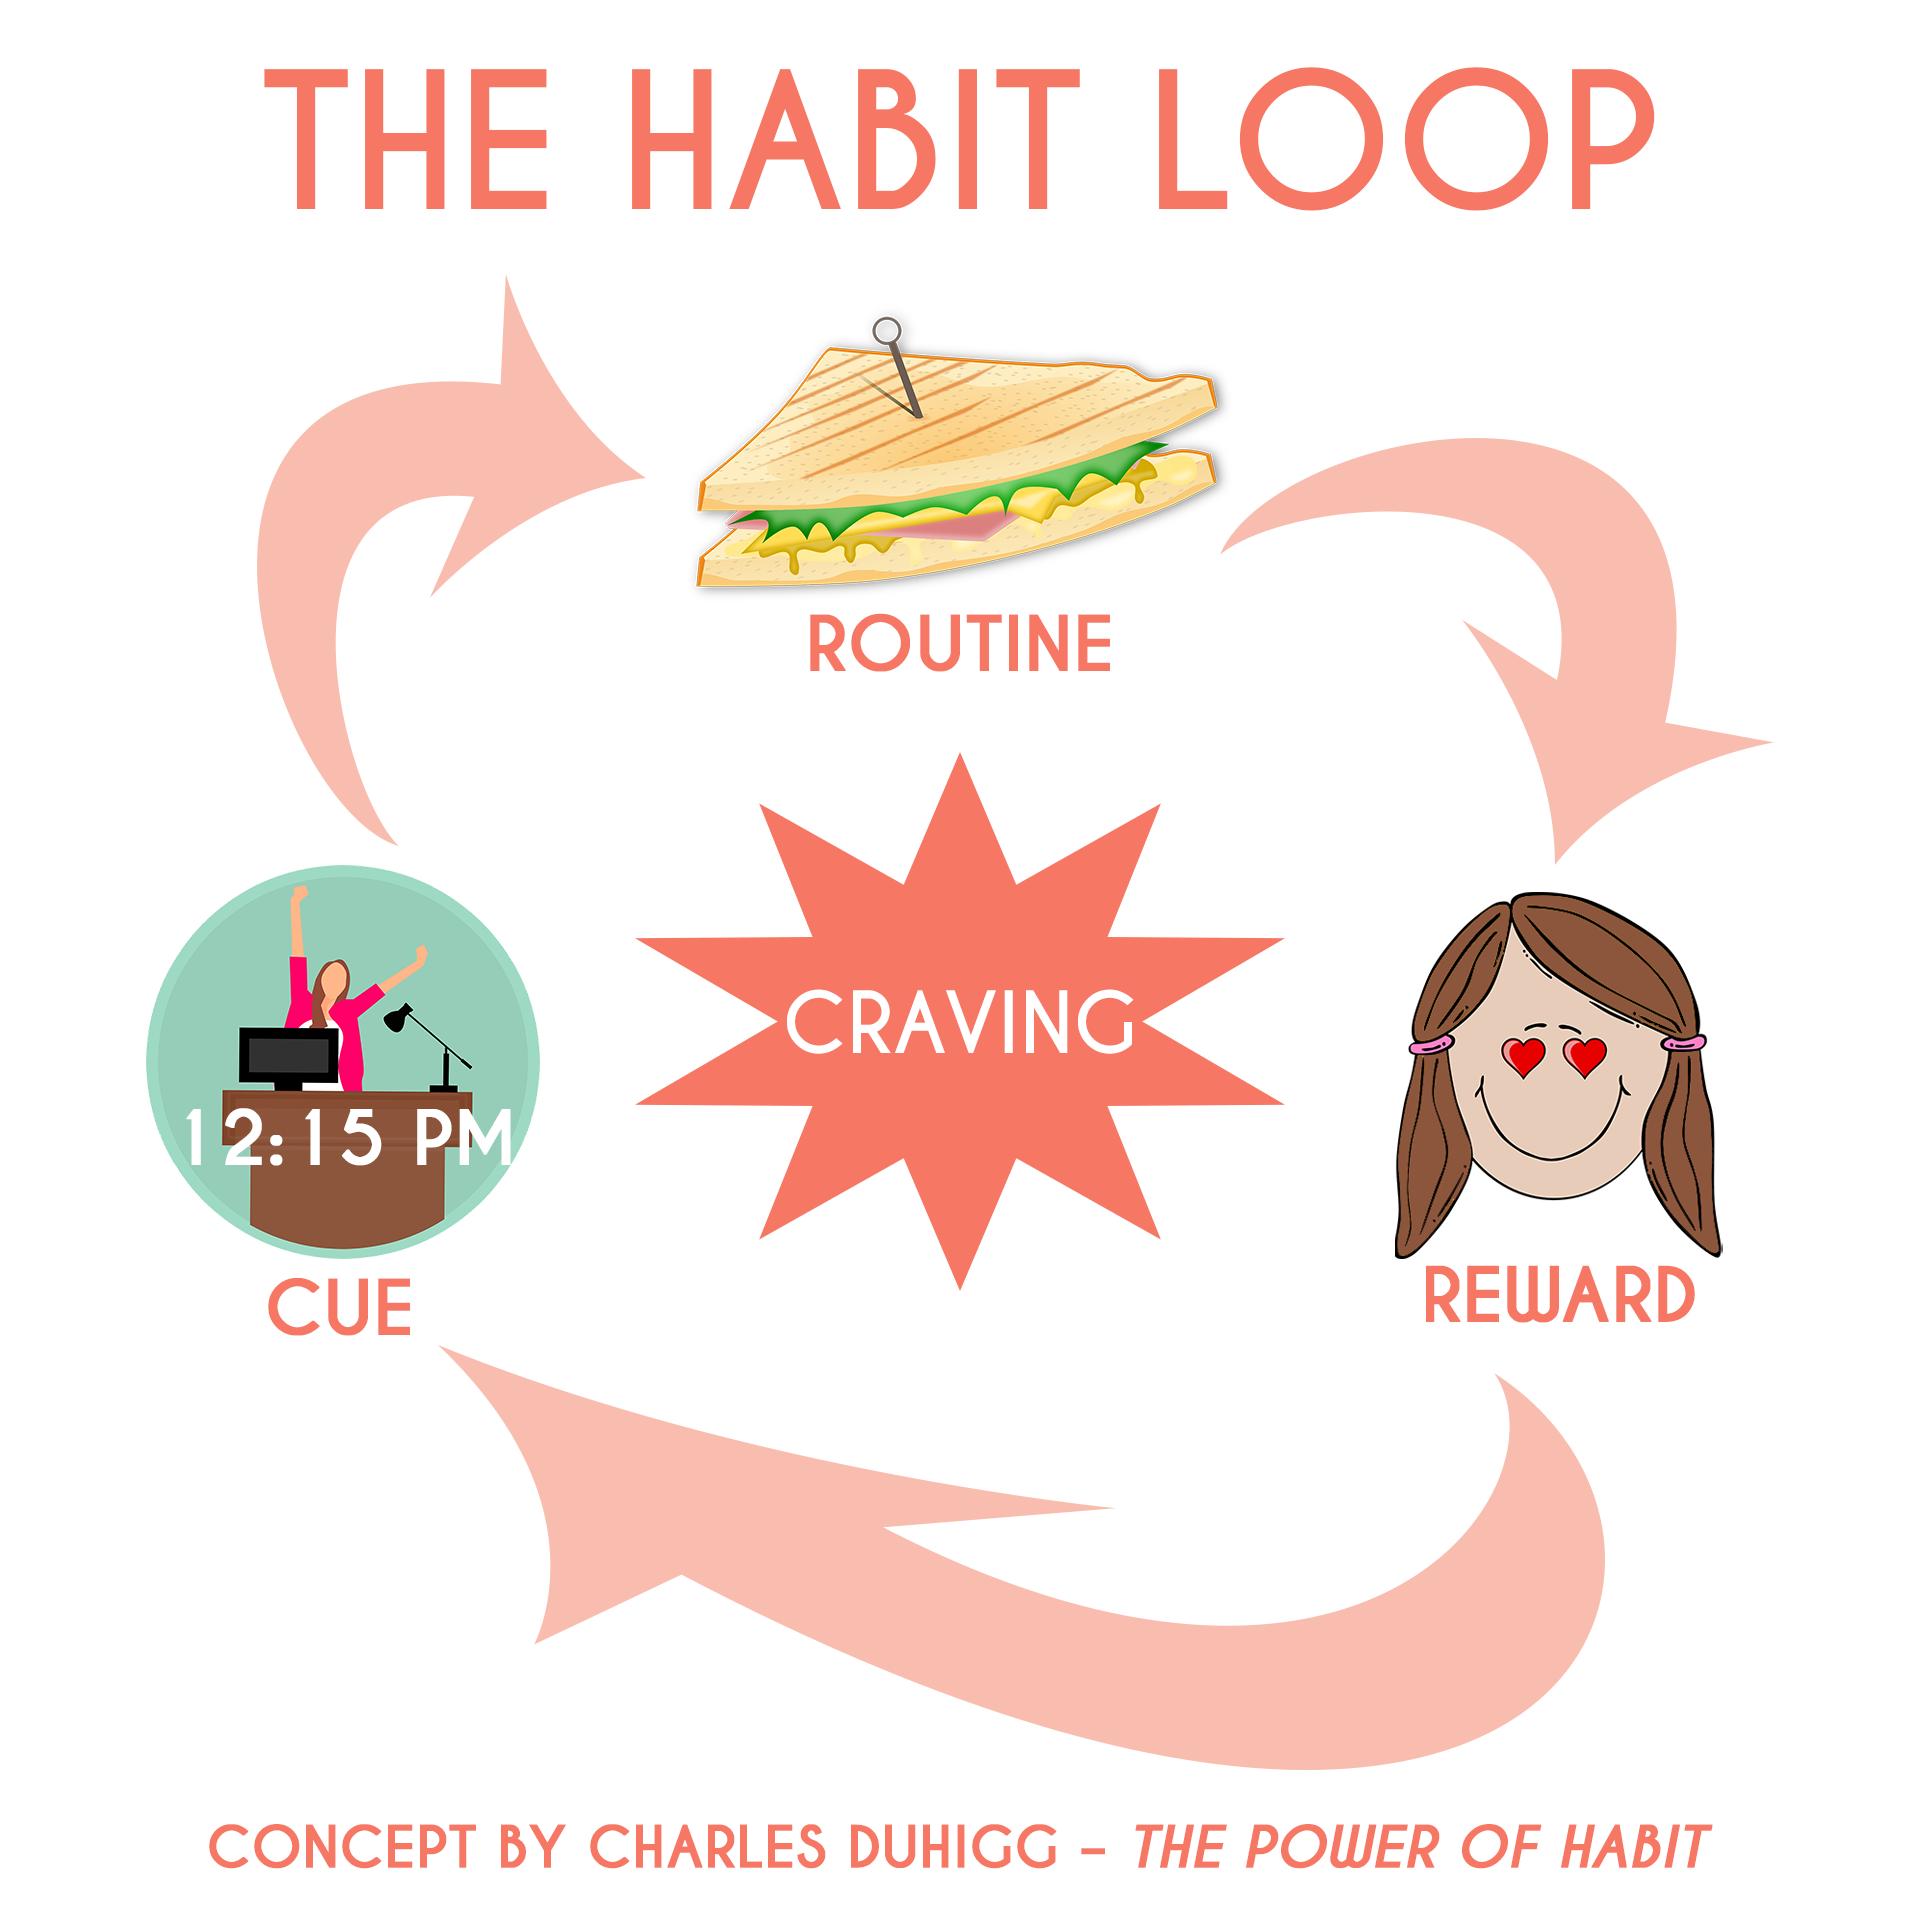 The Habit Loop by Charles Duhigg